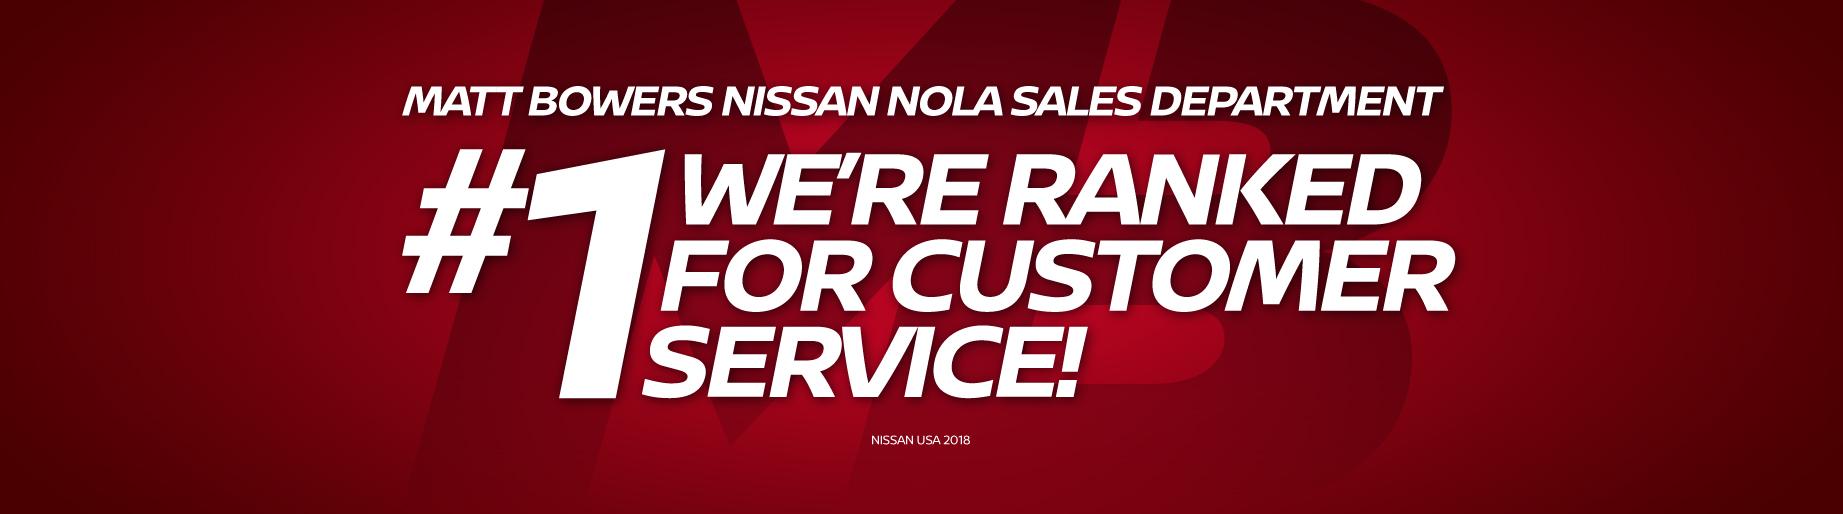 Superb #1 Sales Department For Customer Service